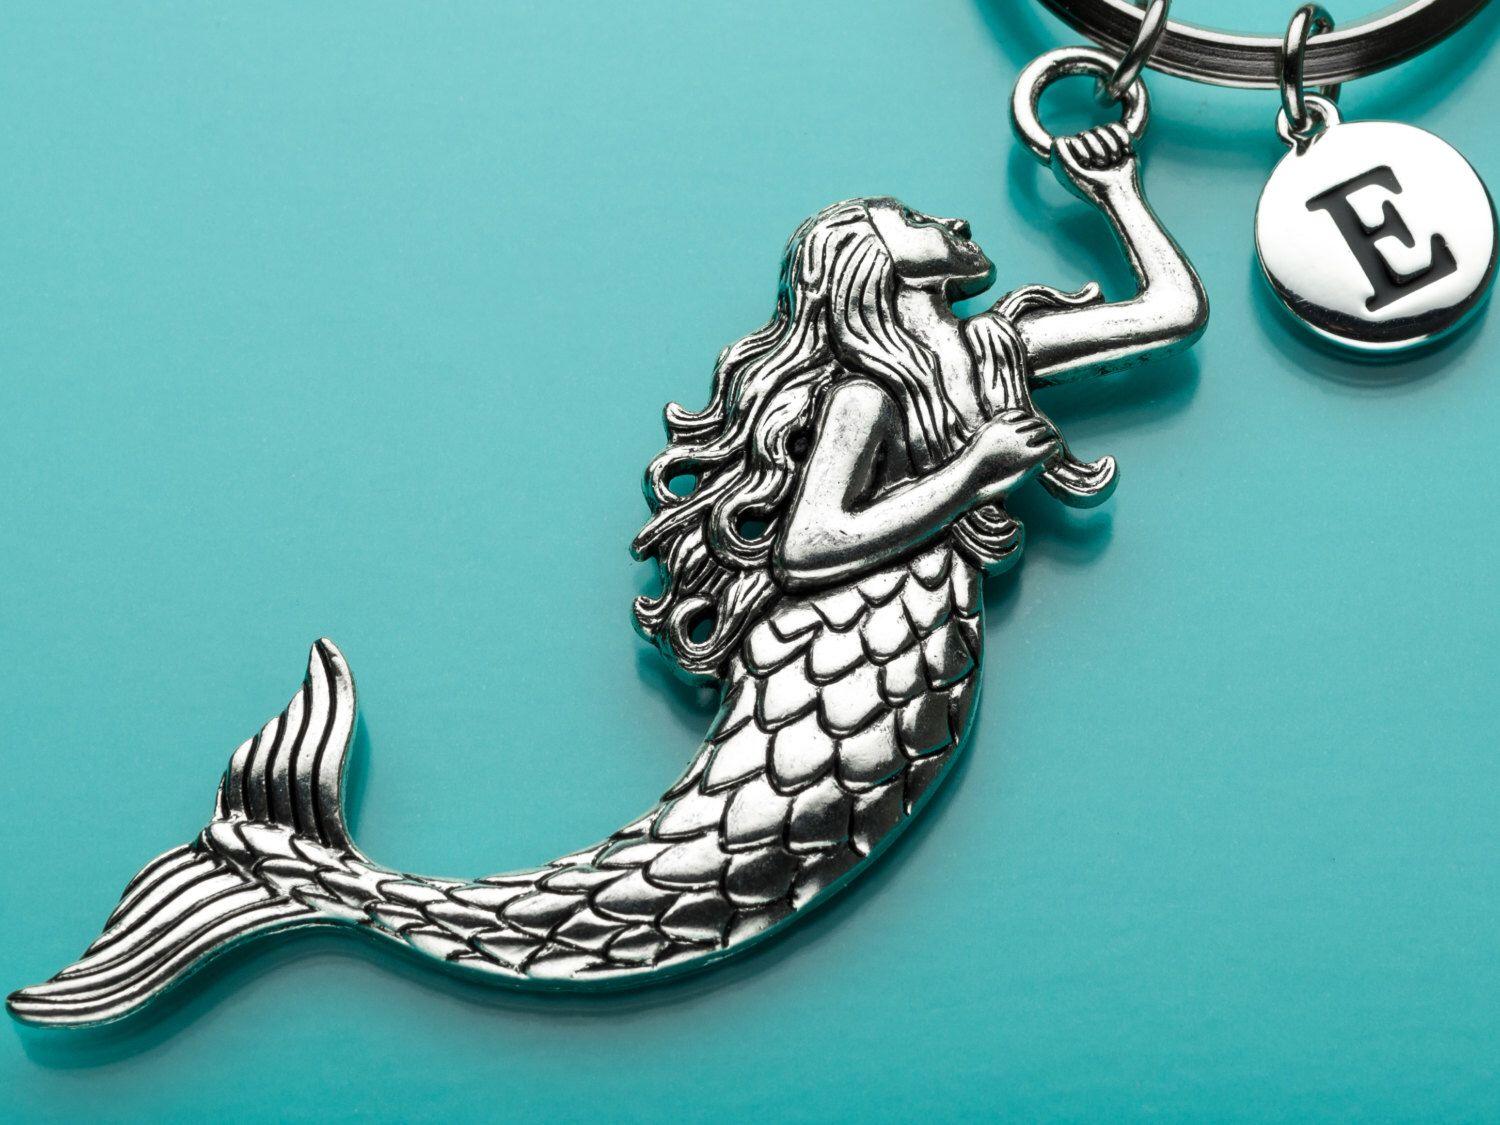 Huge Mermaid Keychain, Mermaid Key Ring, Sea Creature, Initial Keychain, Personalized Keychain, Custom Keychain, Charm Keychain, H9 by promisemeeverything2 on Etsy https://www.etsy.com/listing/226946560/huge-mermaid-keychain-mermaid-key-ring